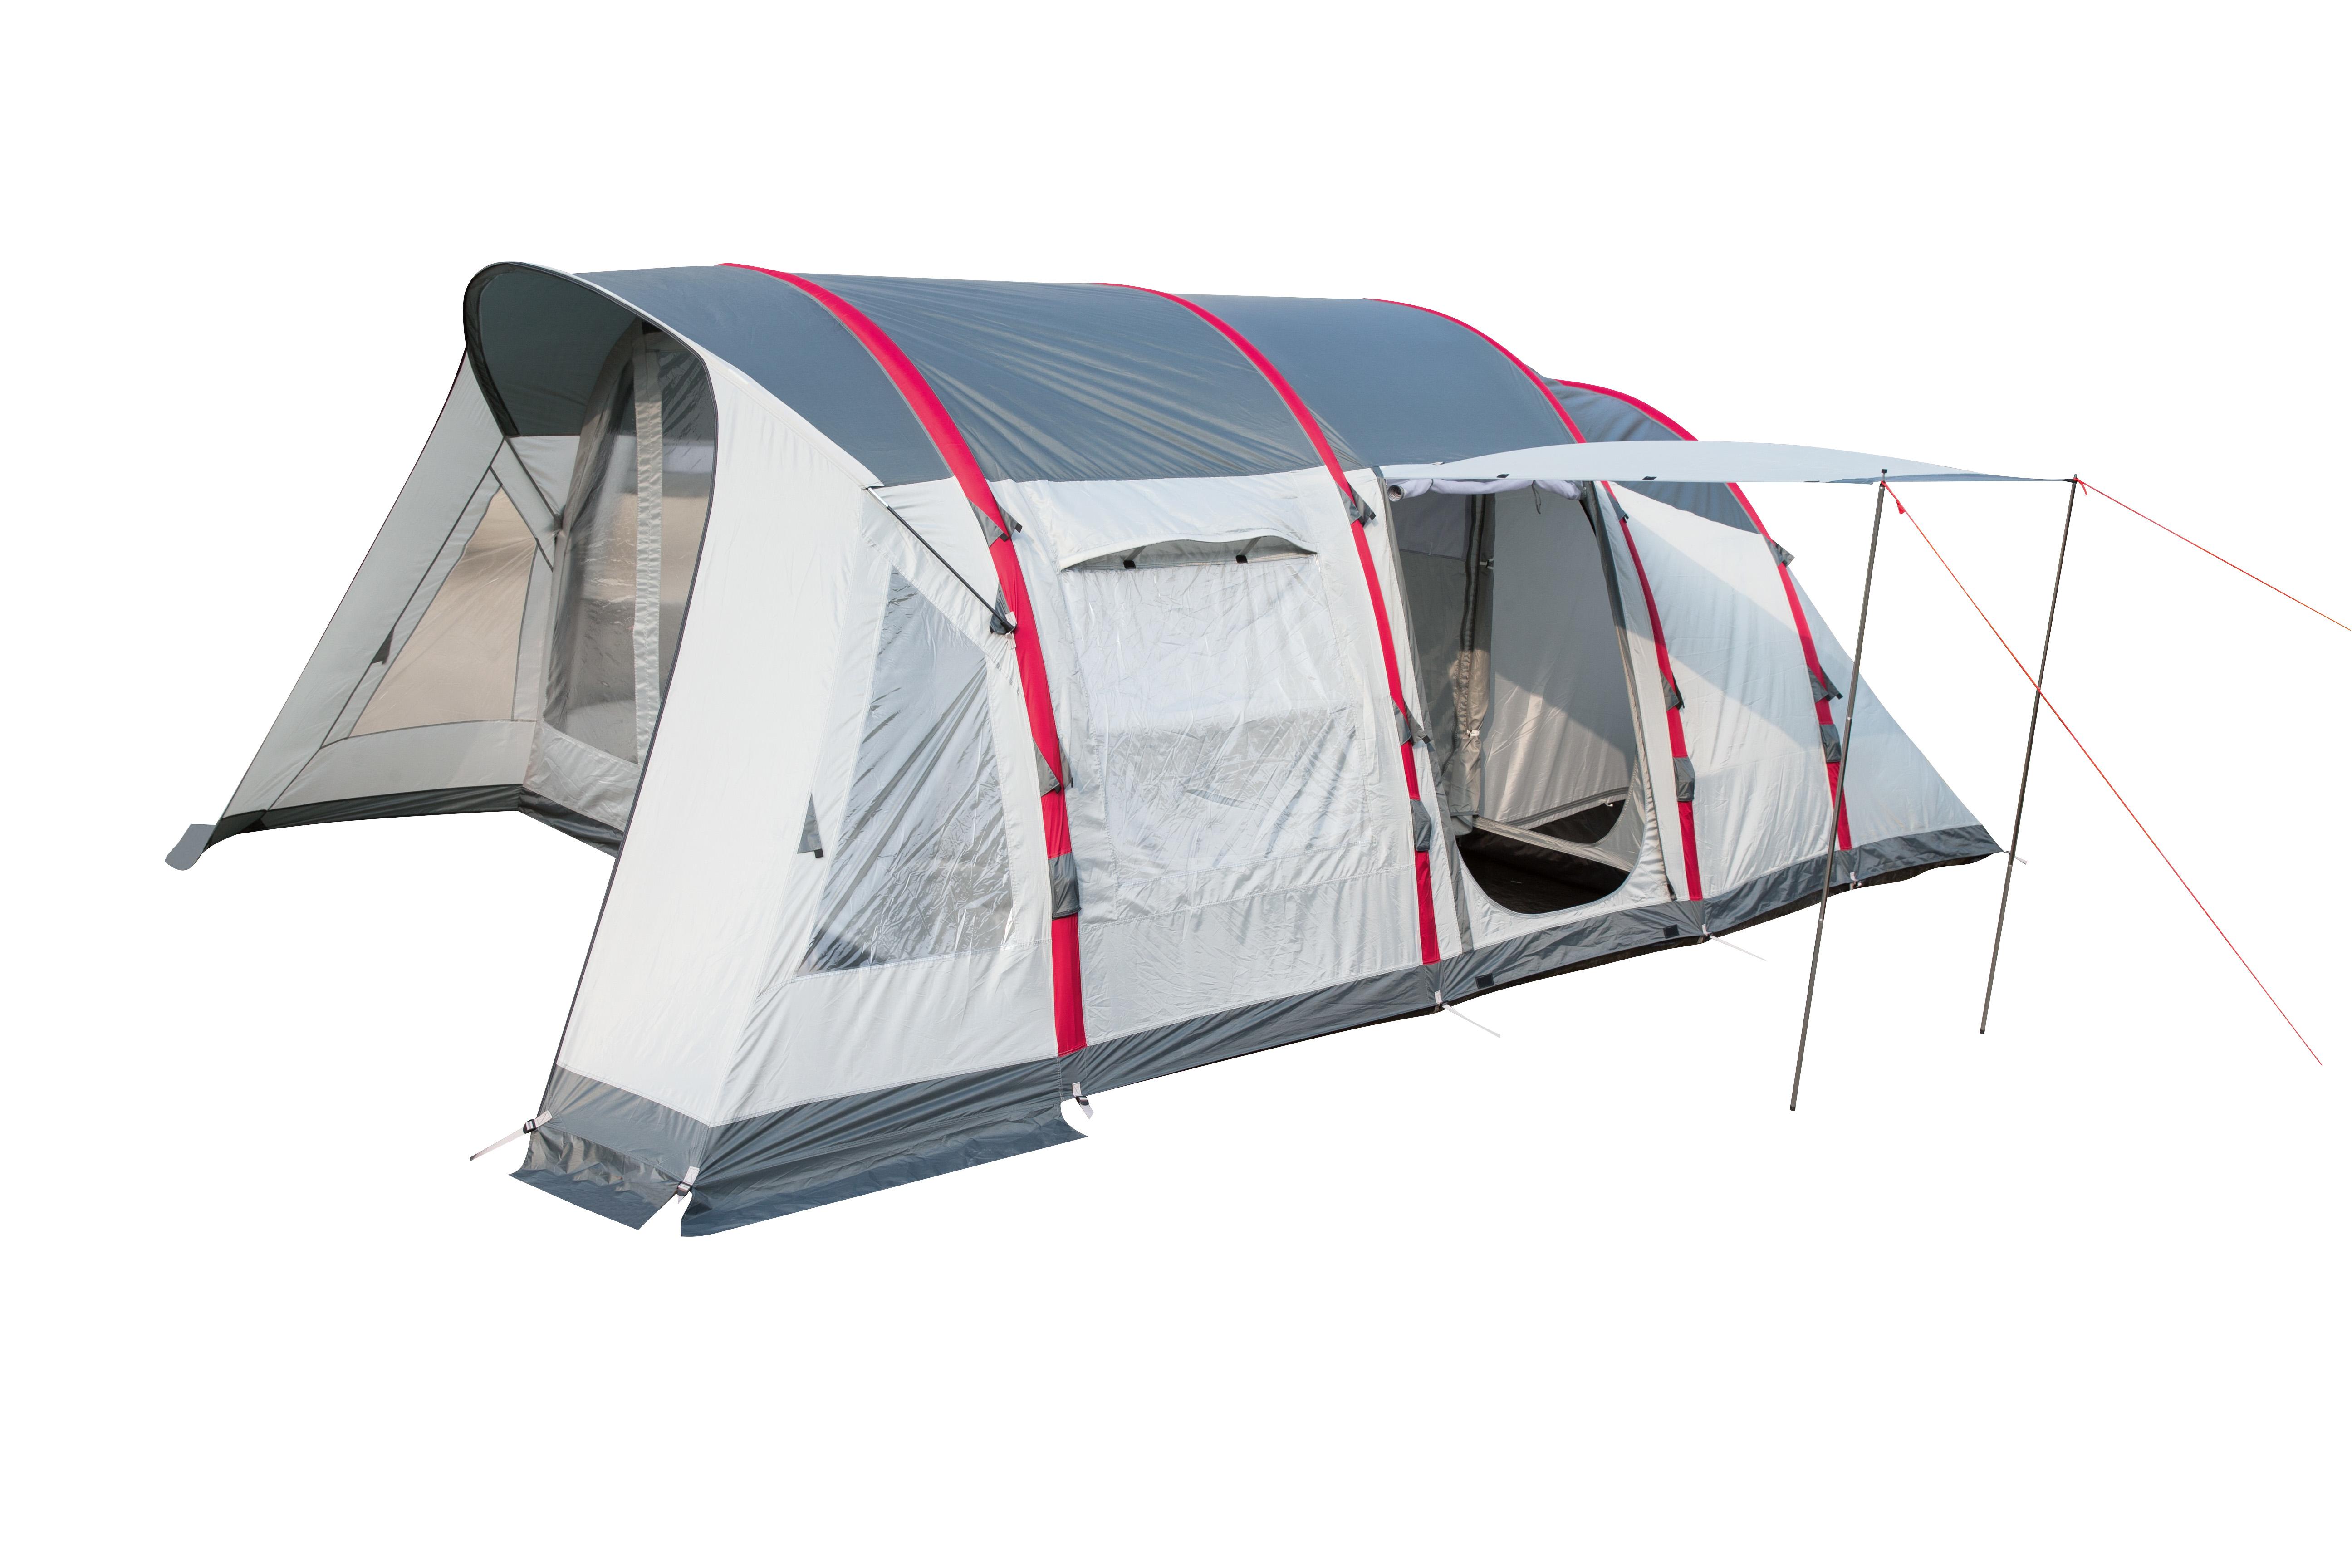 Bestway Sierra Ridge Air Pro X6 Tent - 6 personen